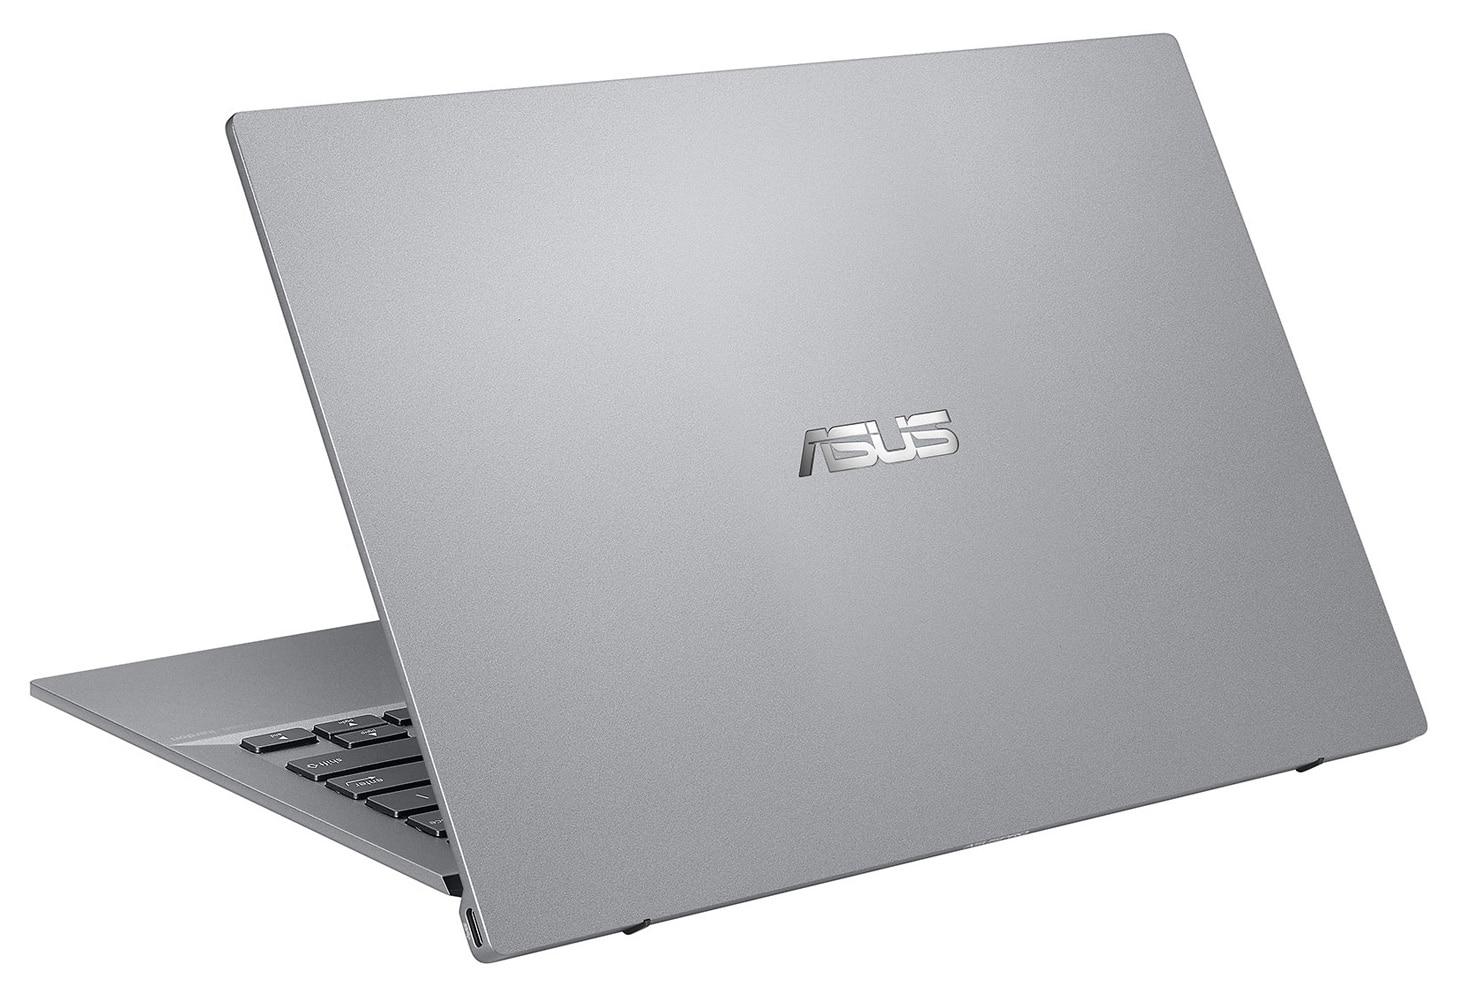 Asus ZenBook Pro 14-78512, ultrabook 14 pouces 1kg Full IPS i7 SSD512 à 1349€